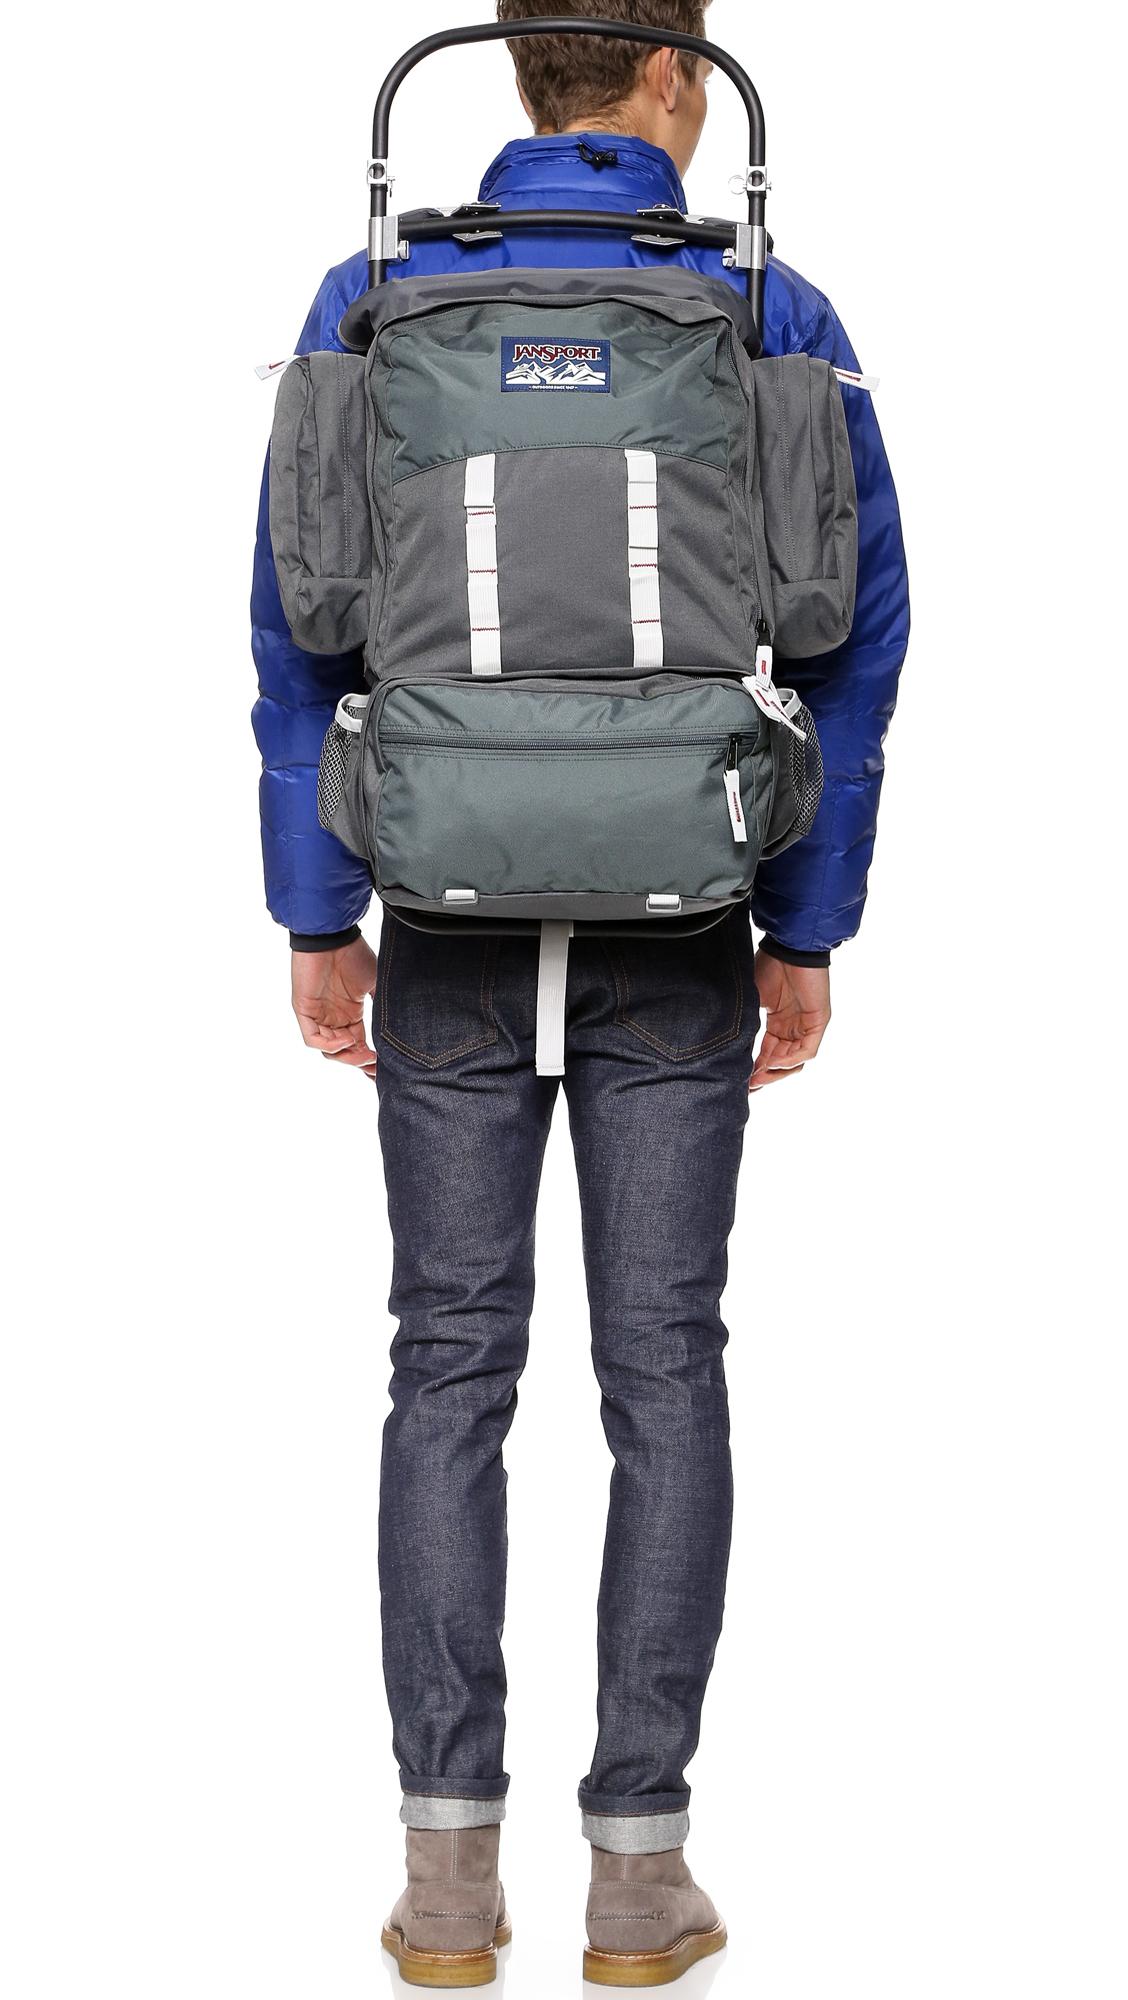 Jansport External Frame Backpack Parts bff229e579a42